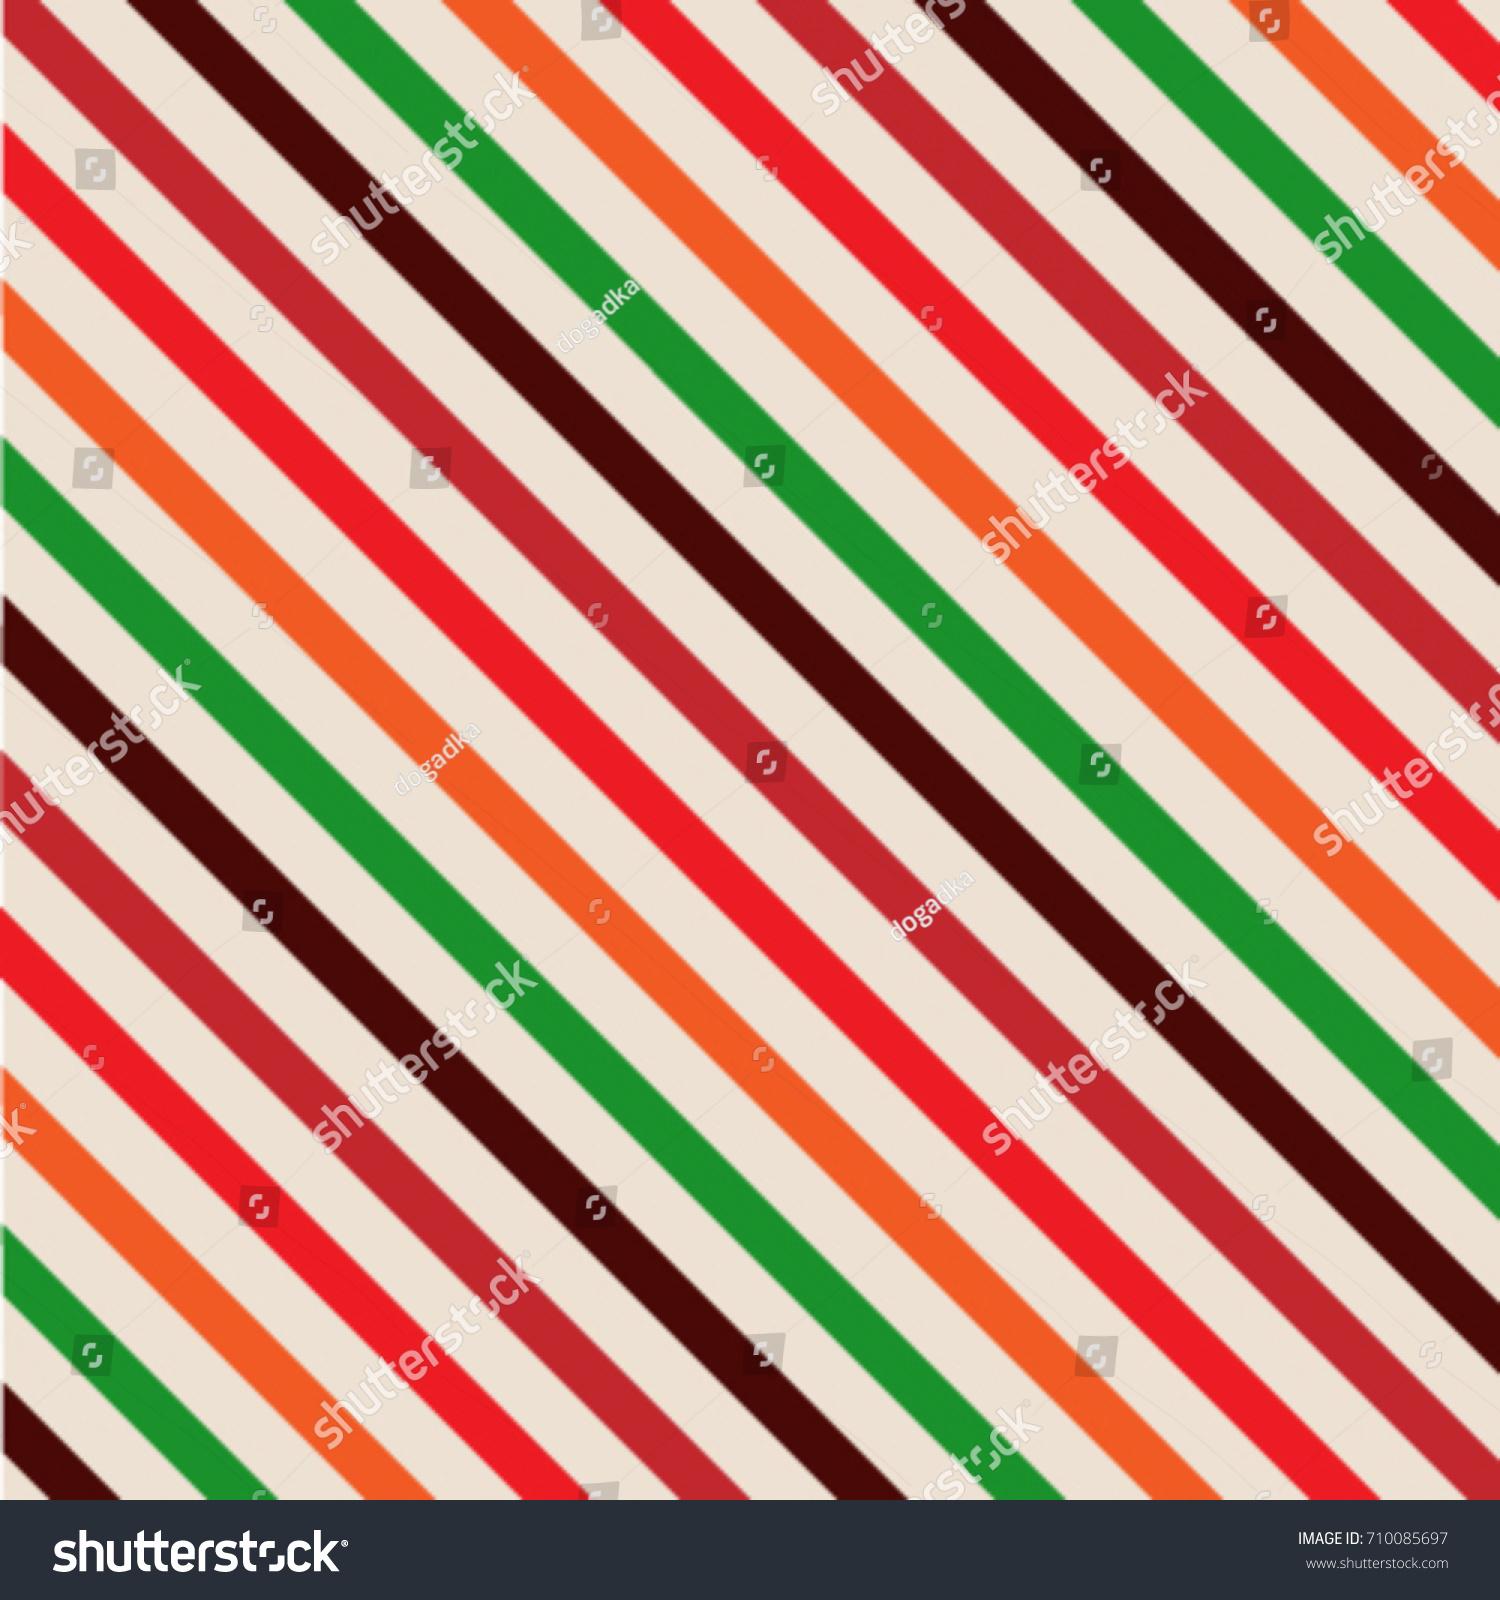 Red Diagonal Stripes Stock Vector 710085697 - Shutterstock